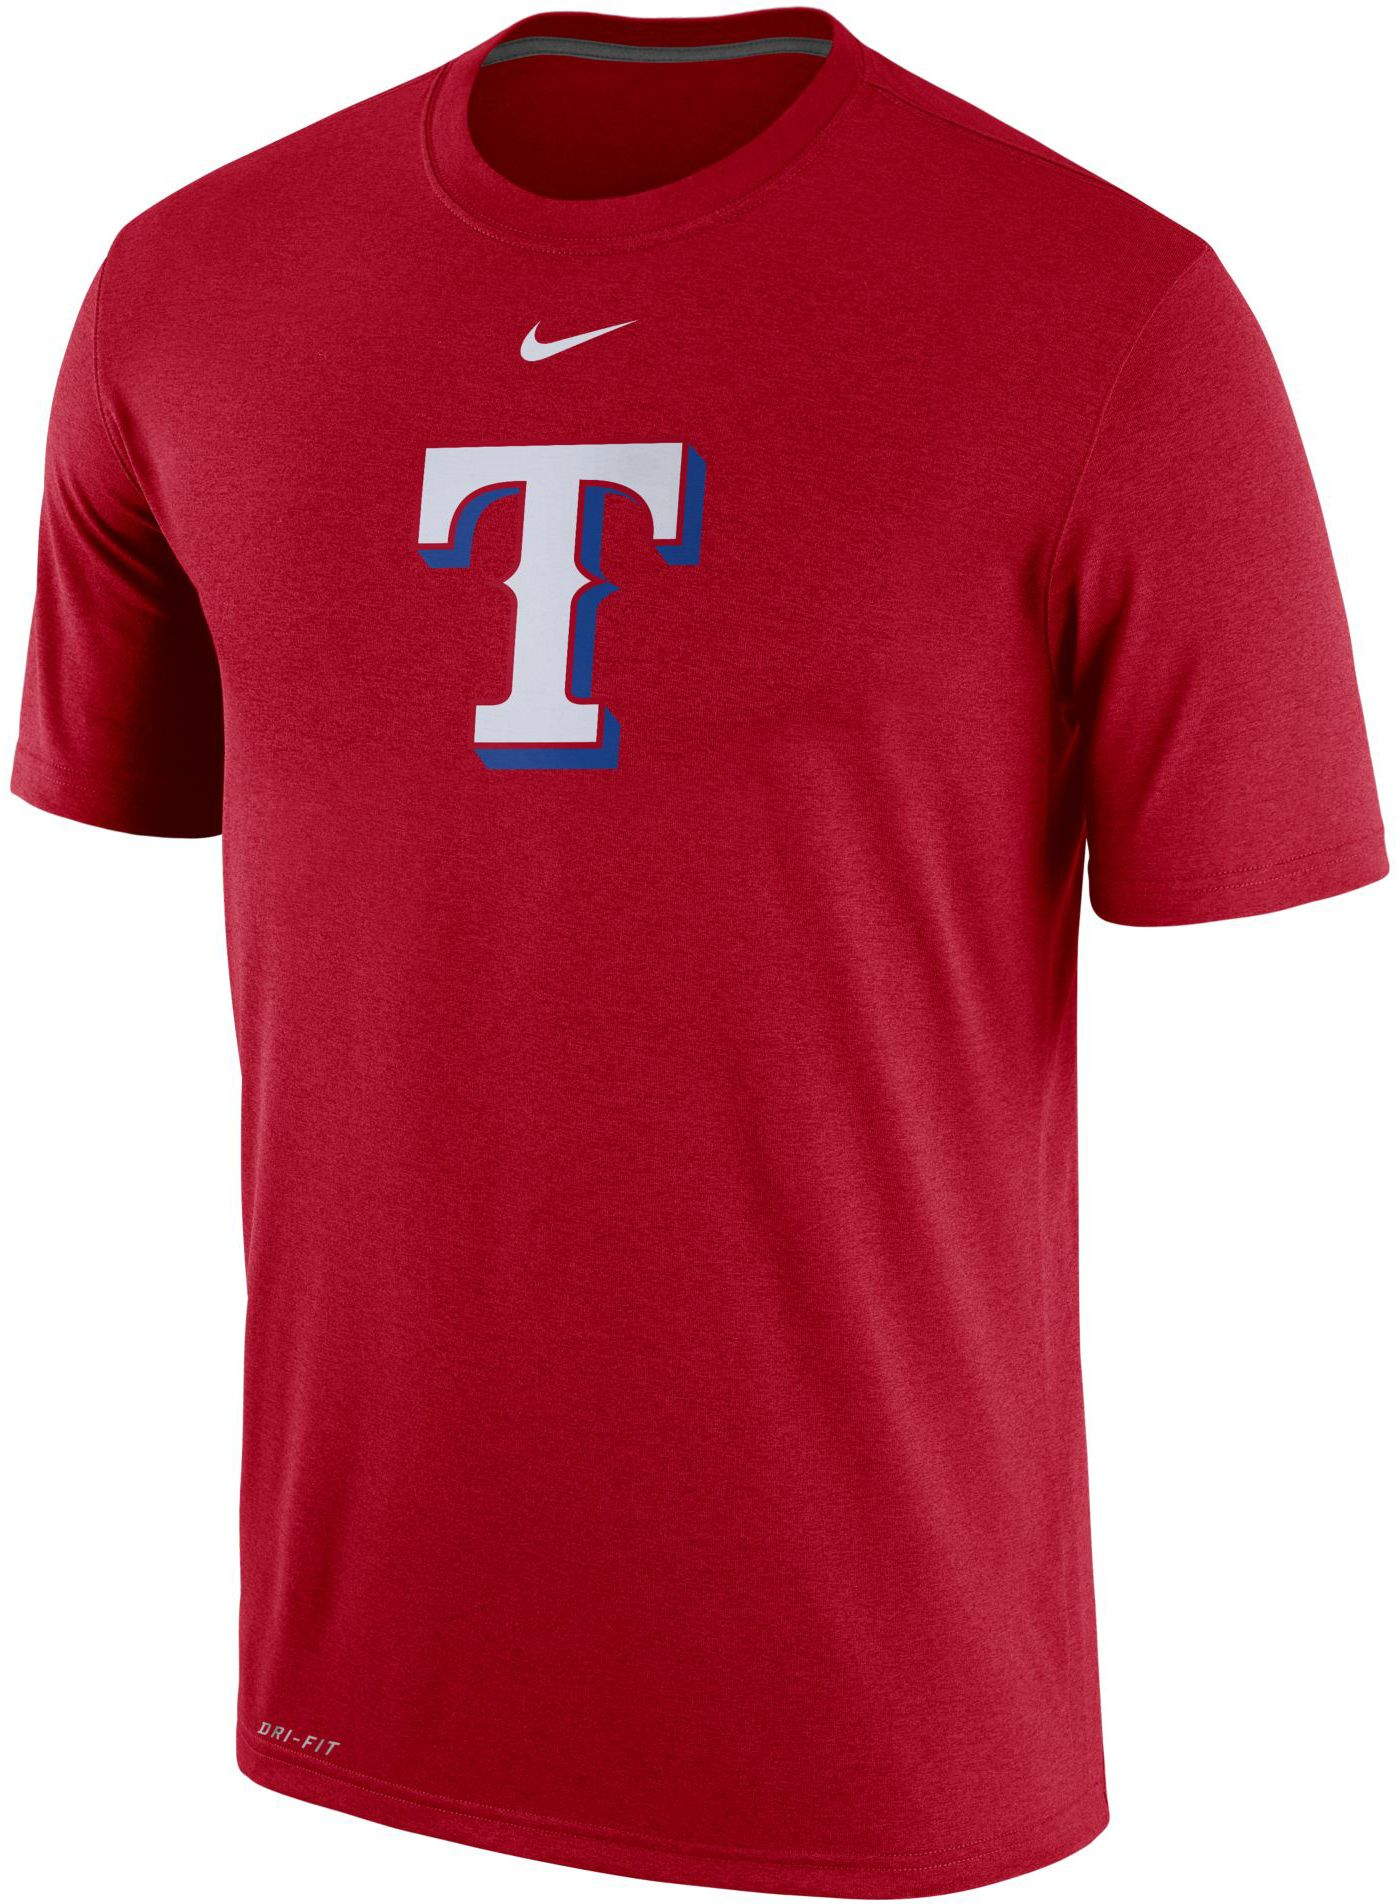 Nike Men's Texas Rangers Dri-FIT Legend T-Shirt